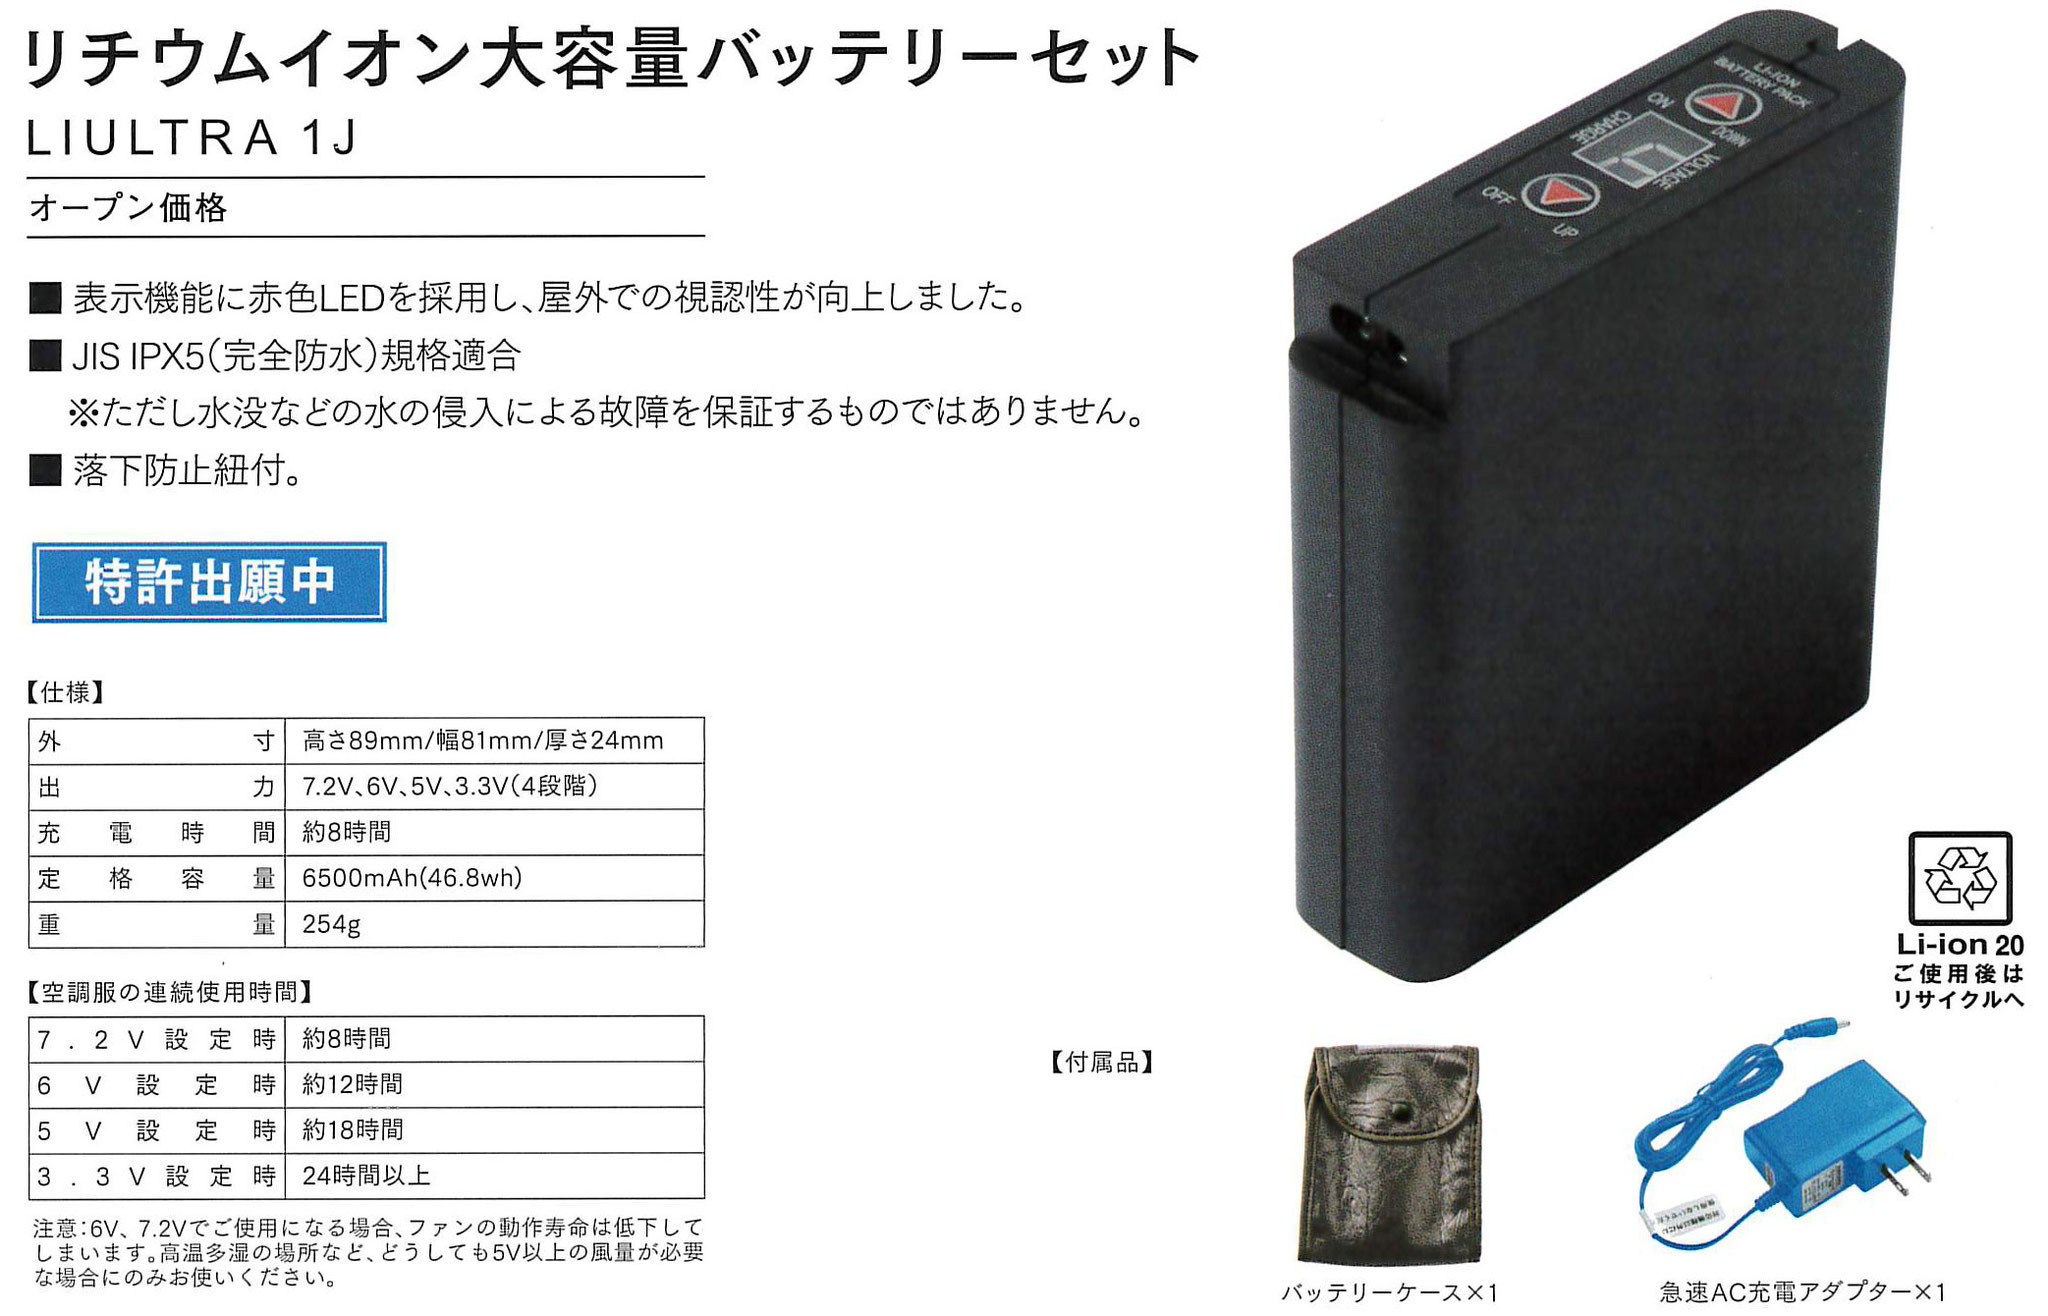 LIULTRA 1J リチウムイオン大容量バッテリーセット ¥9,900(税込)